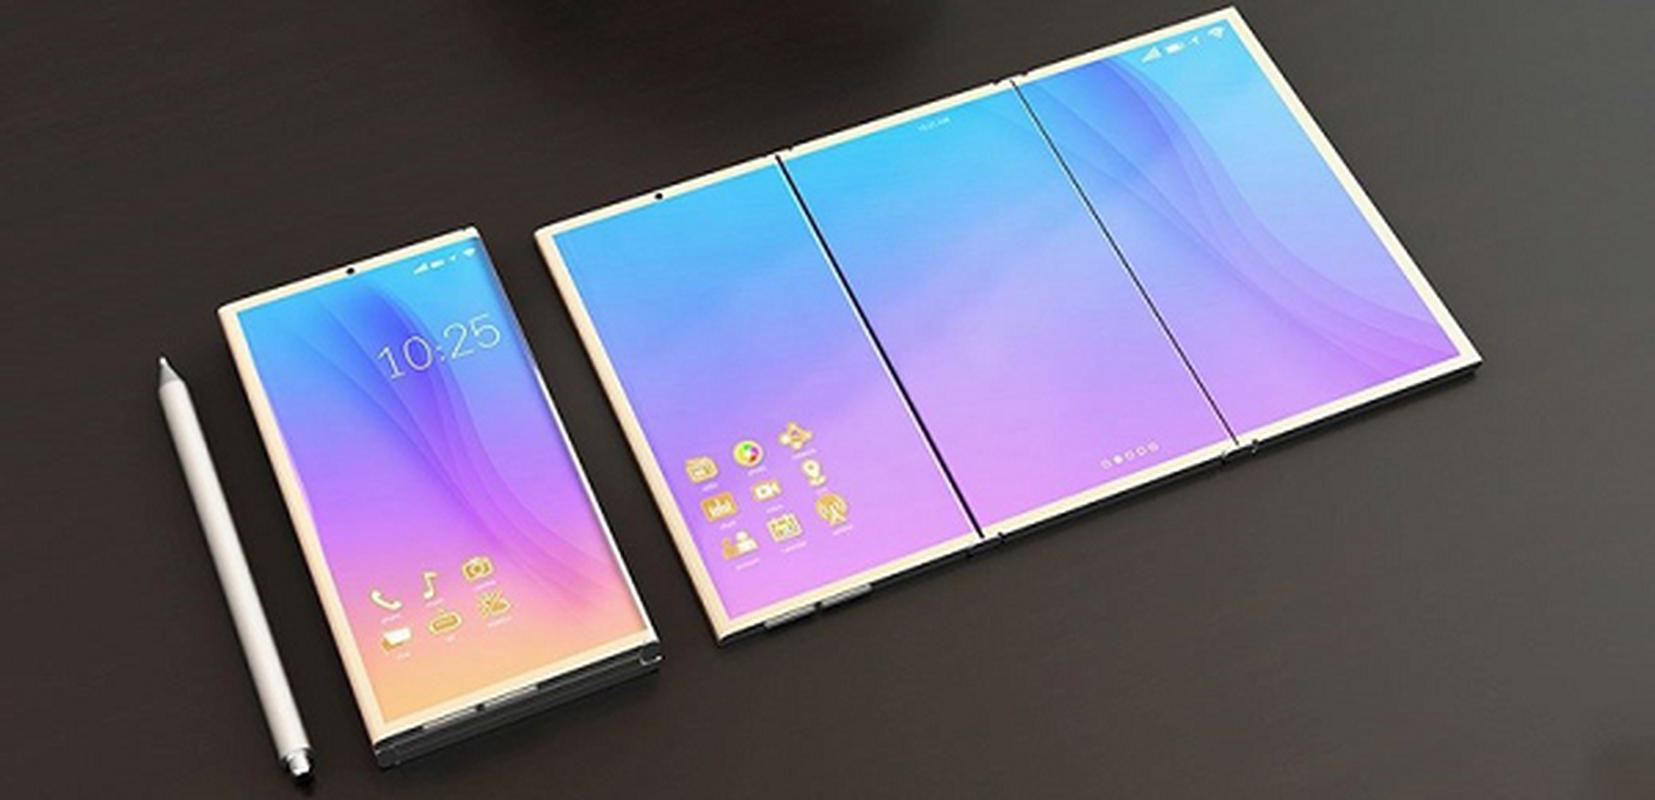 Soi can canh tablet ba man hinh gap cua Samsung sap ra mat-Hinh-11